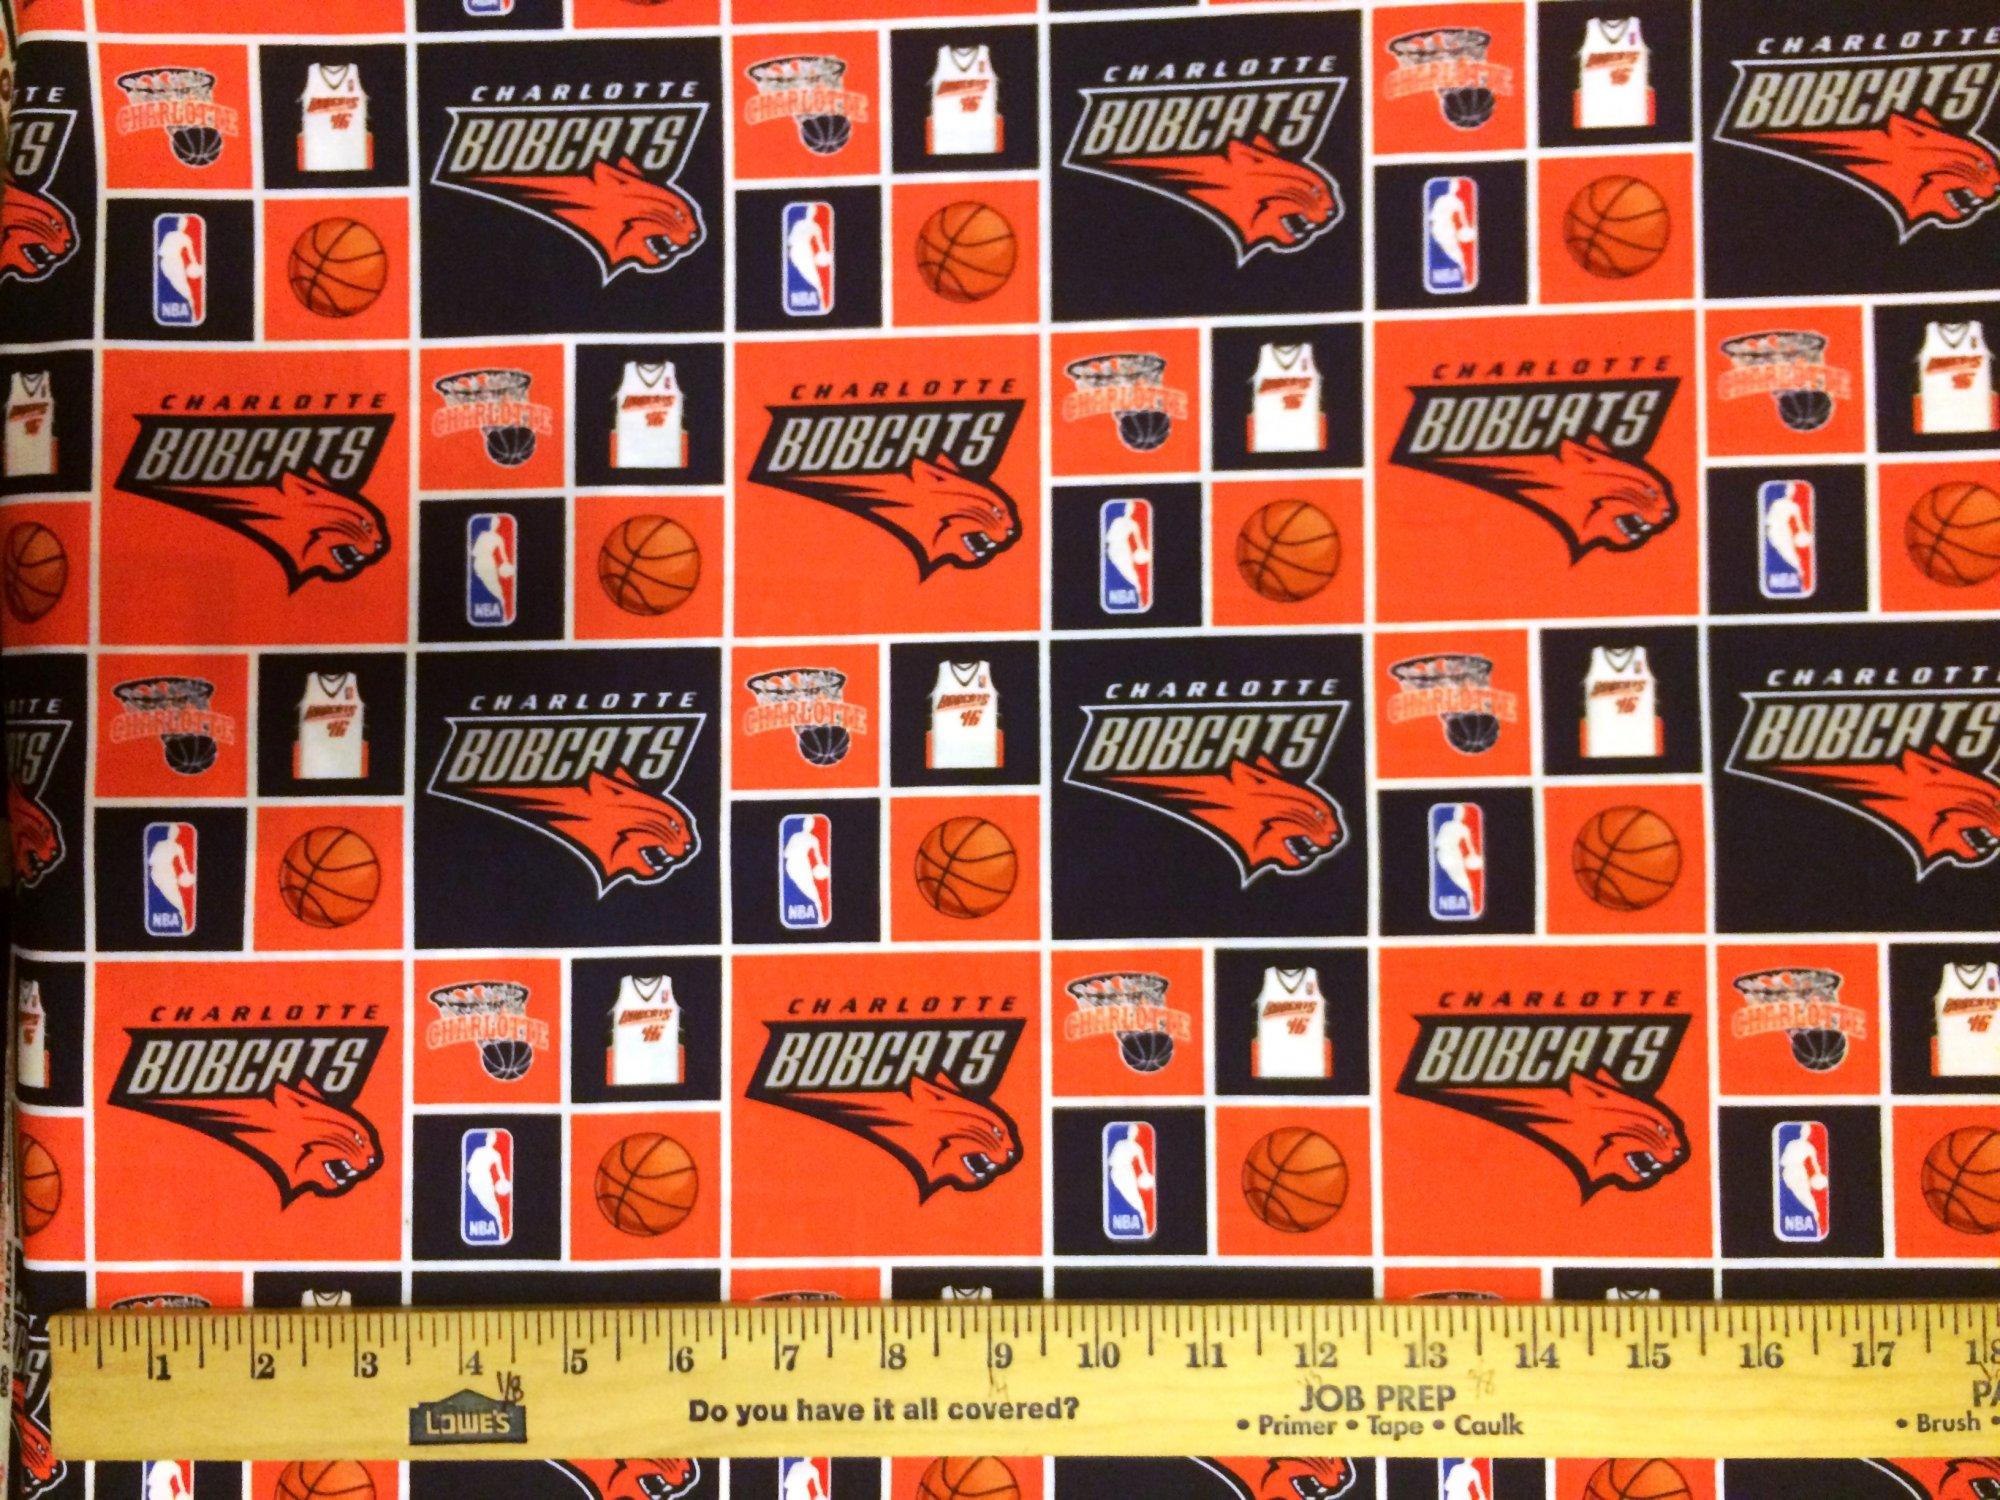 NBA Charlotte Bobcats 020 Orange/Navy